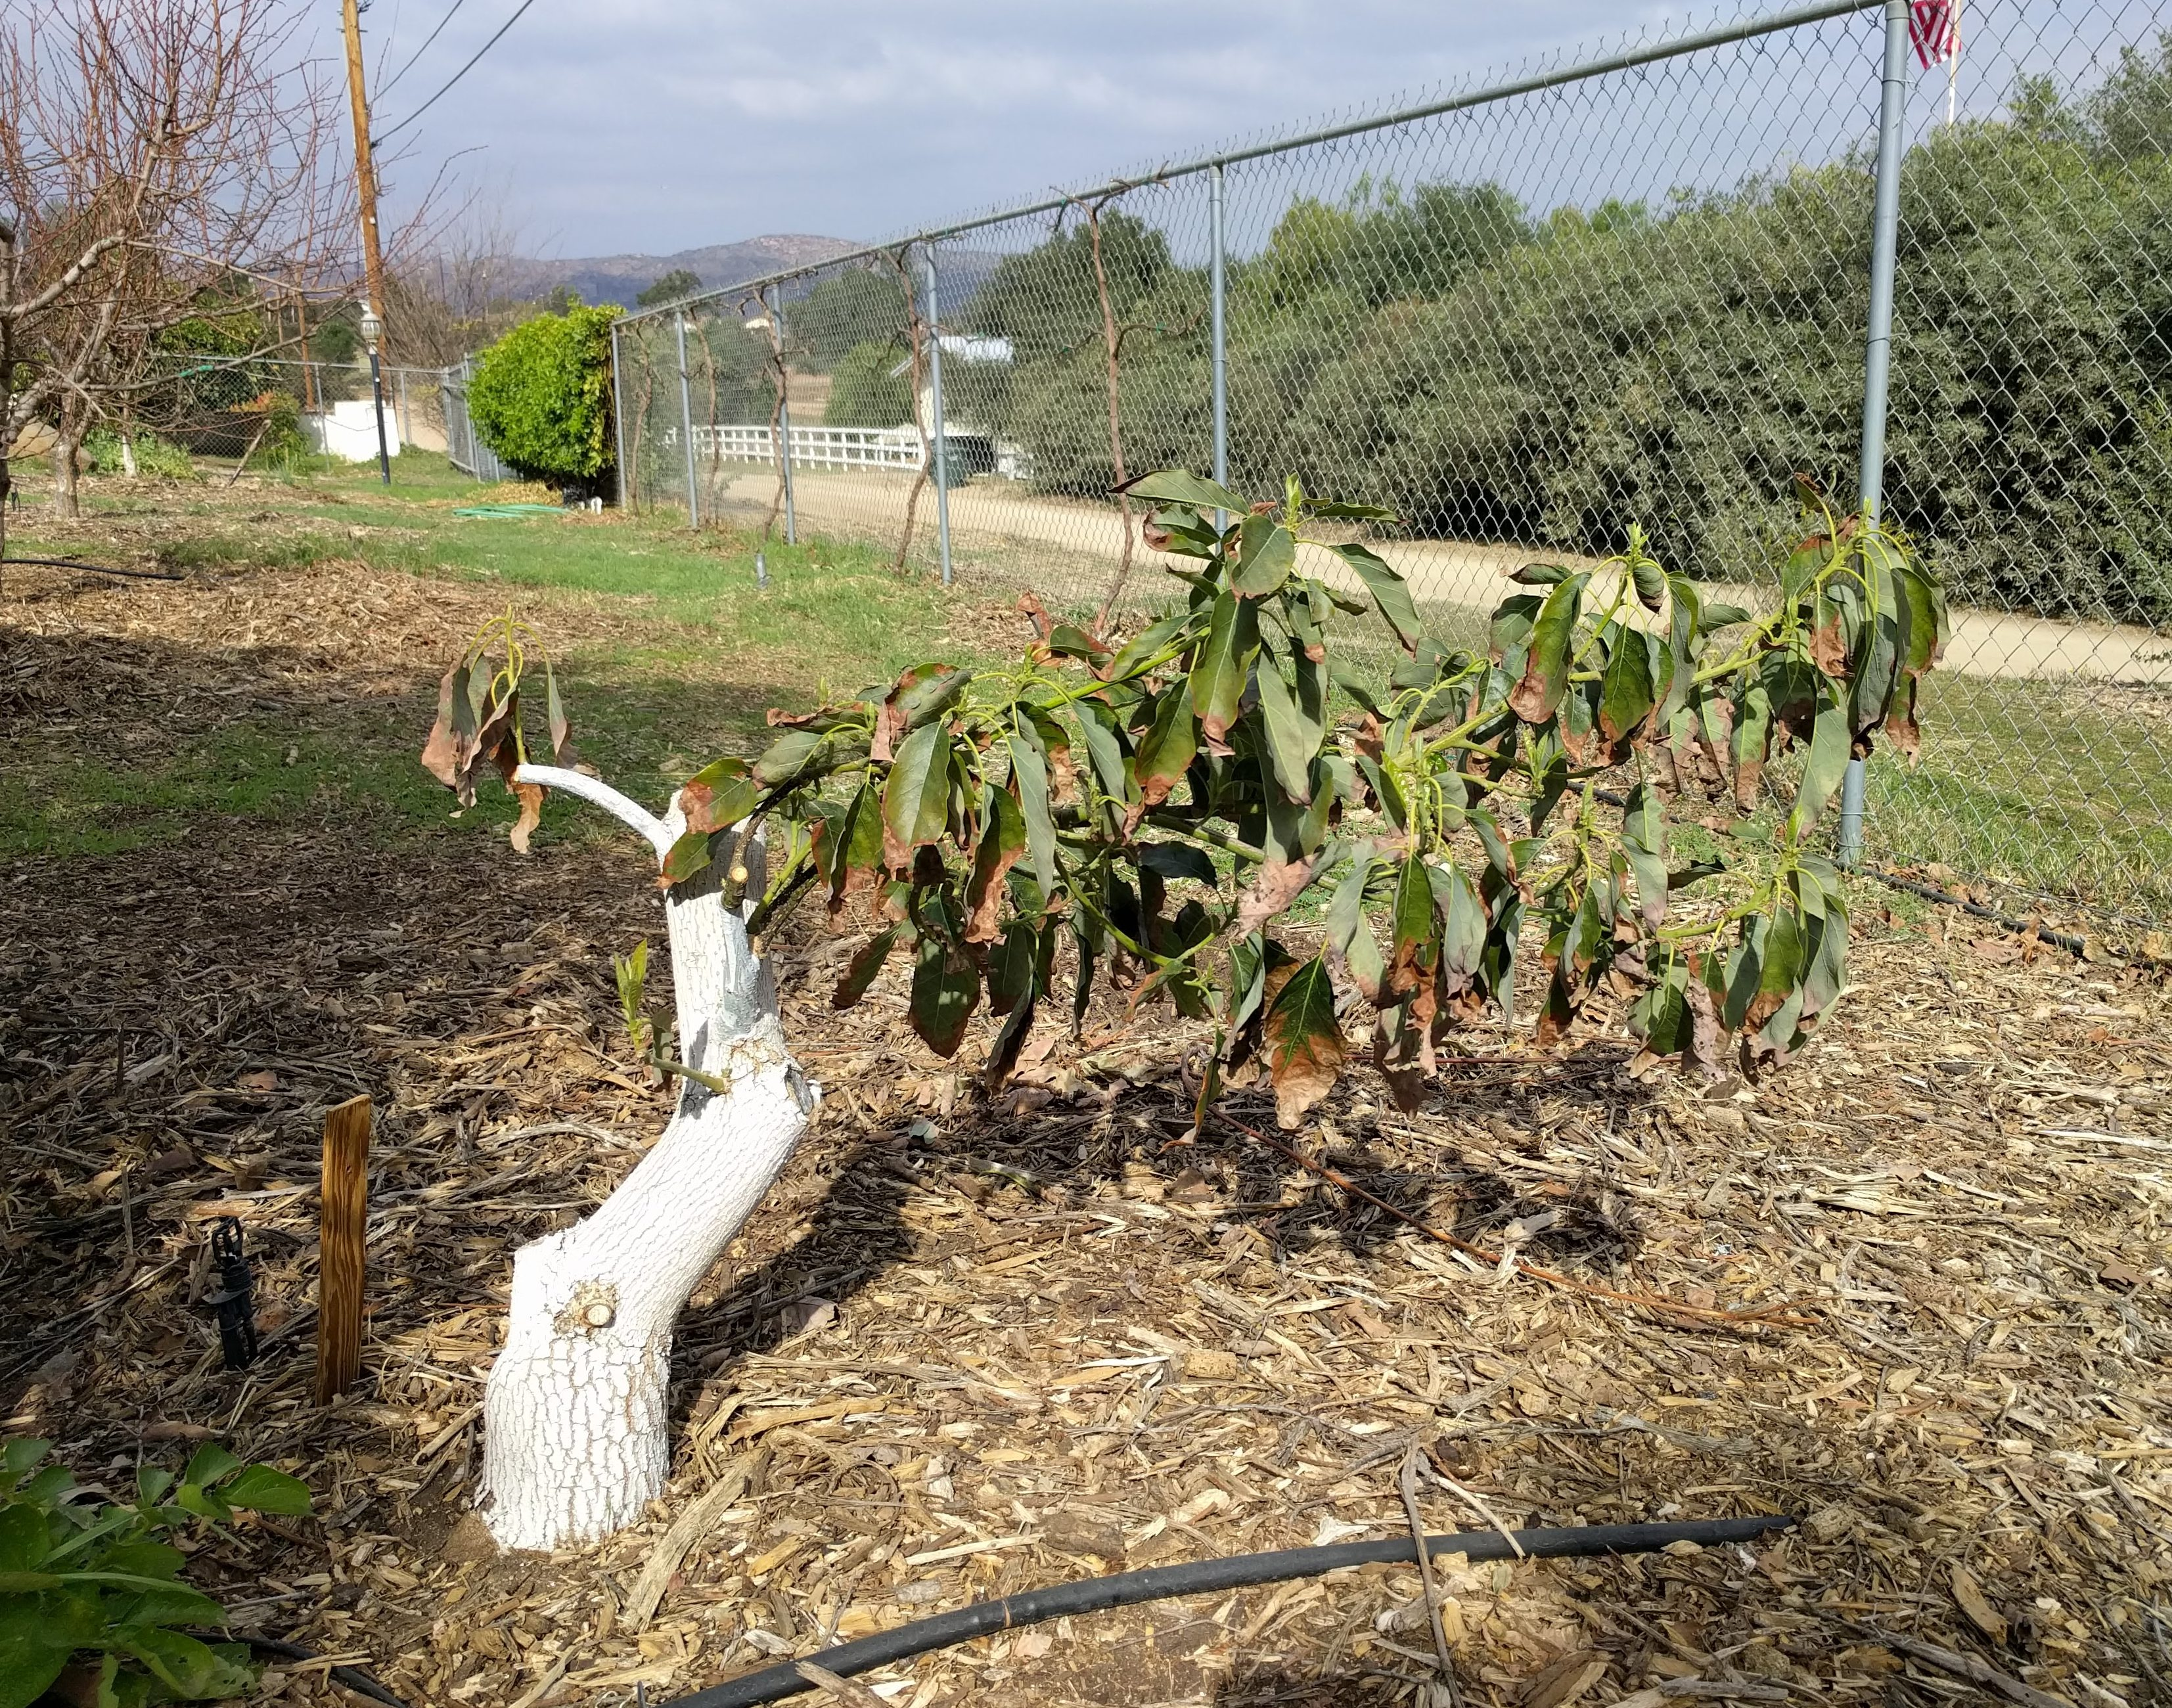 Pruning avocado trees - Greg Alder's Yard Posts: Food Gardening in